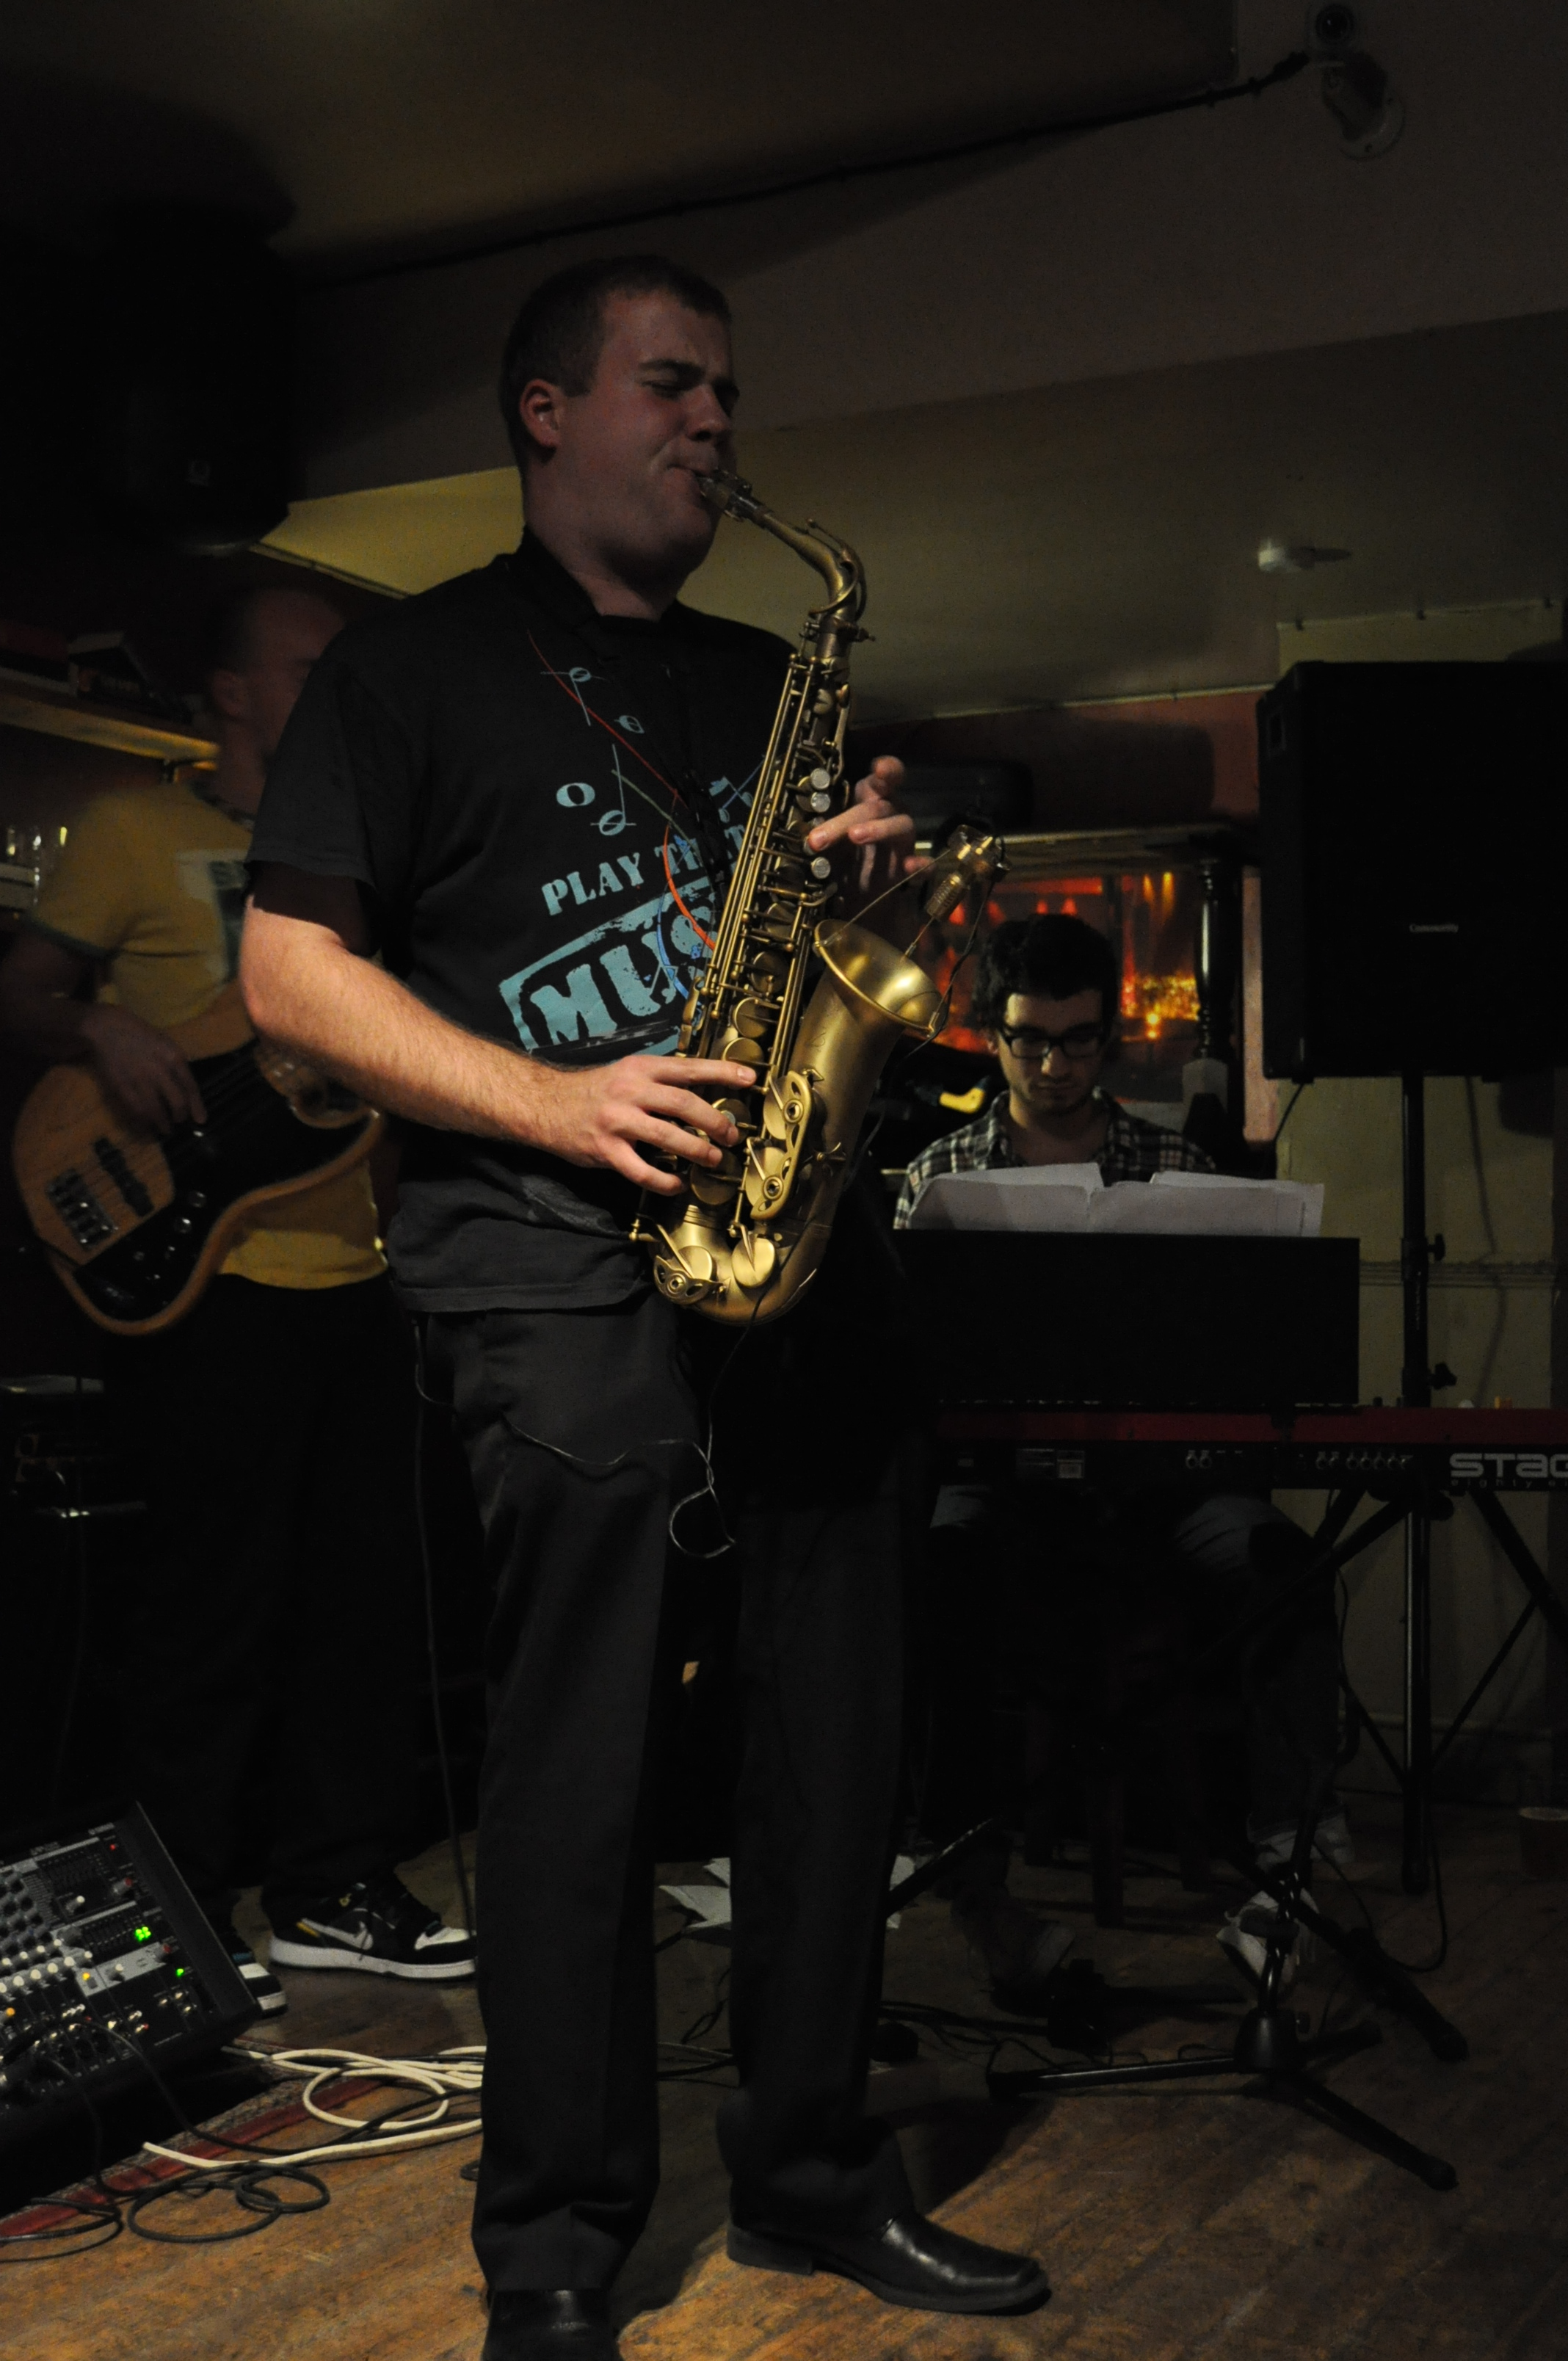 Marek-Tomaszewski-Sax-Player-Concert-The-Dignity